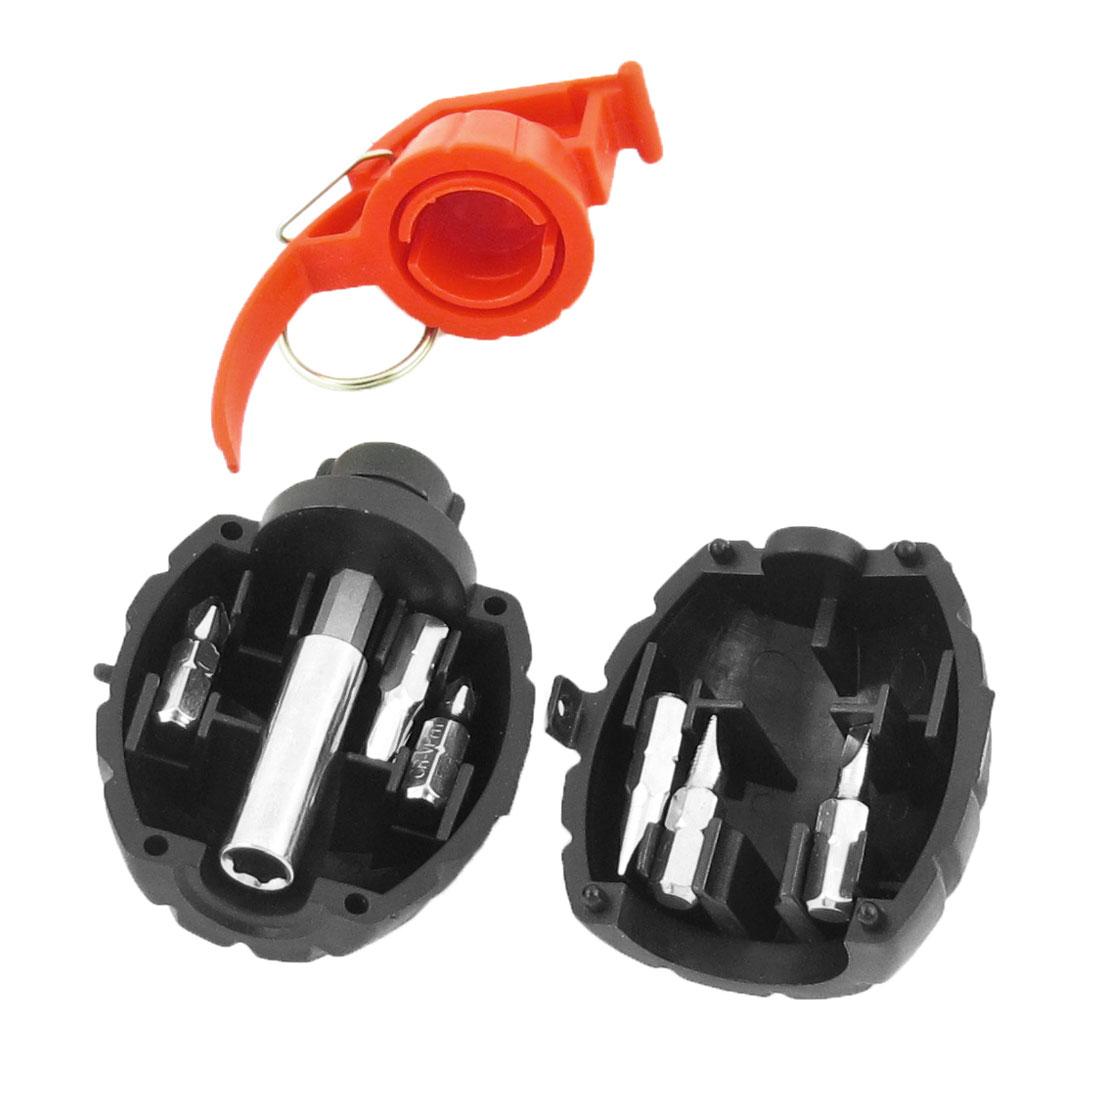 Black Red Grenades Shape Case Phillips Slotted Bit Screwdriver 7in 1